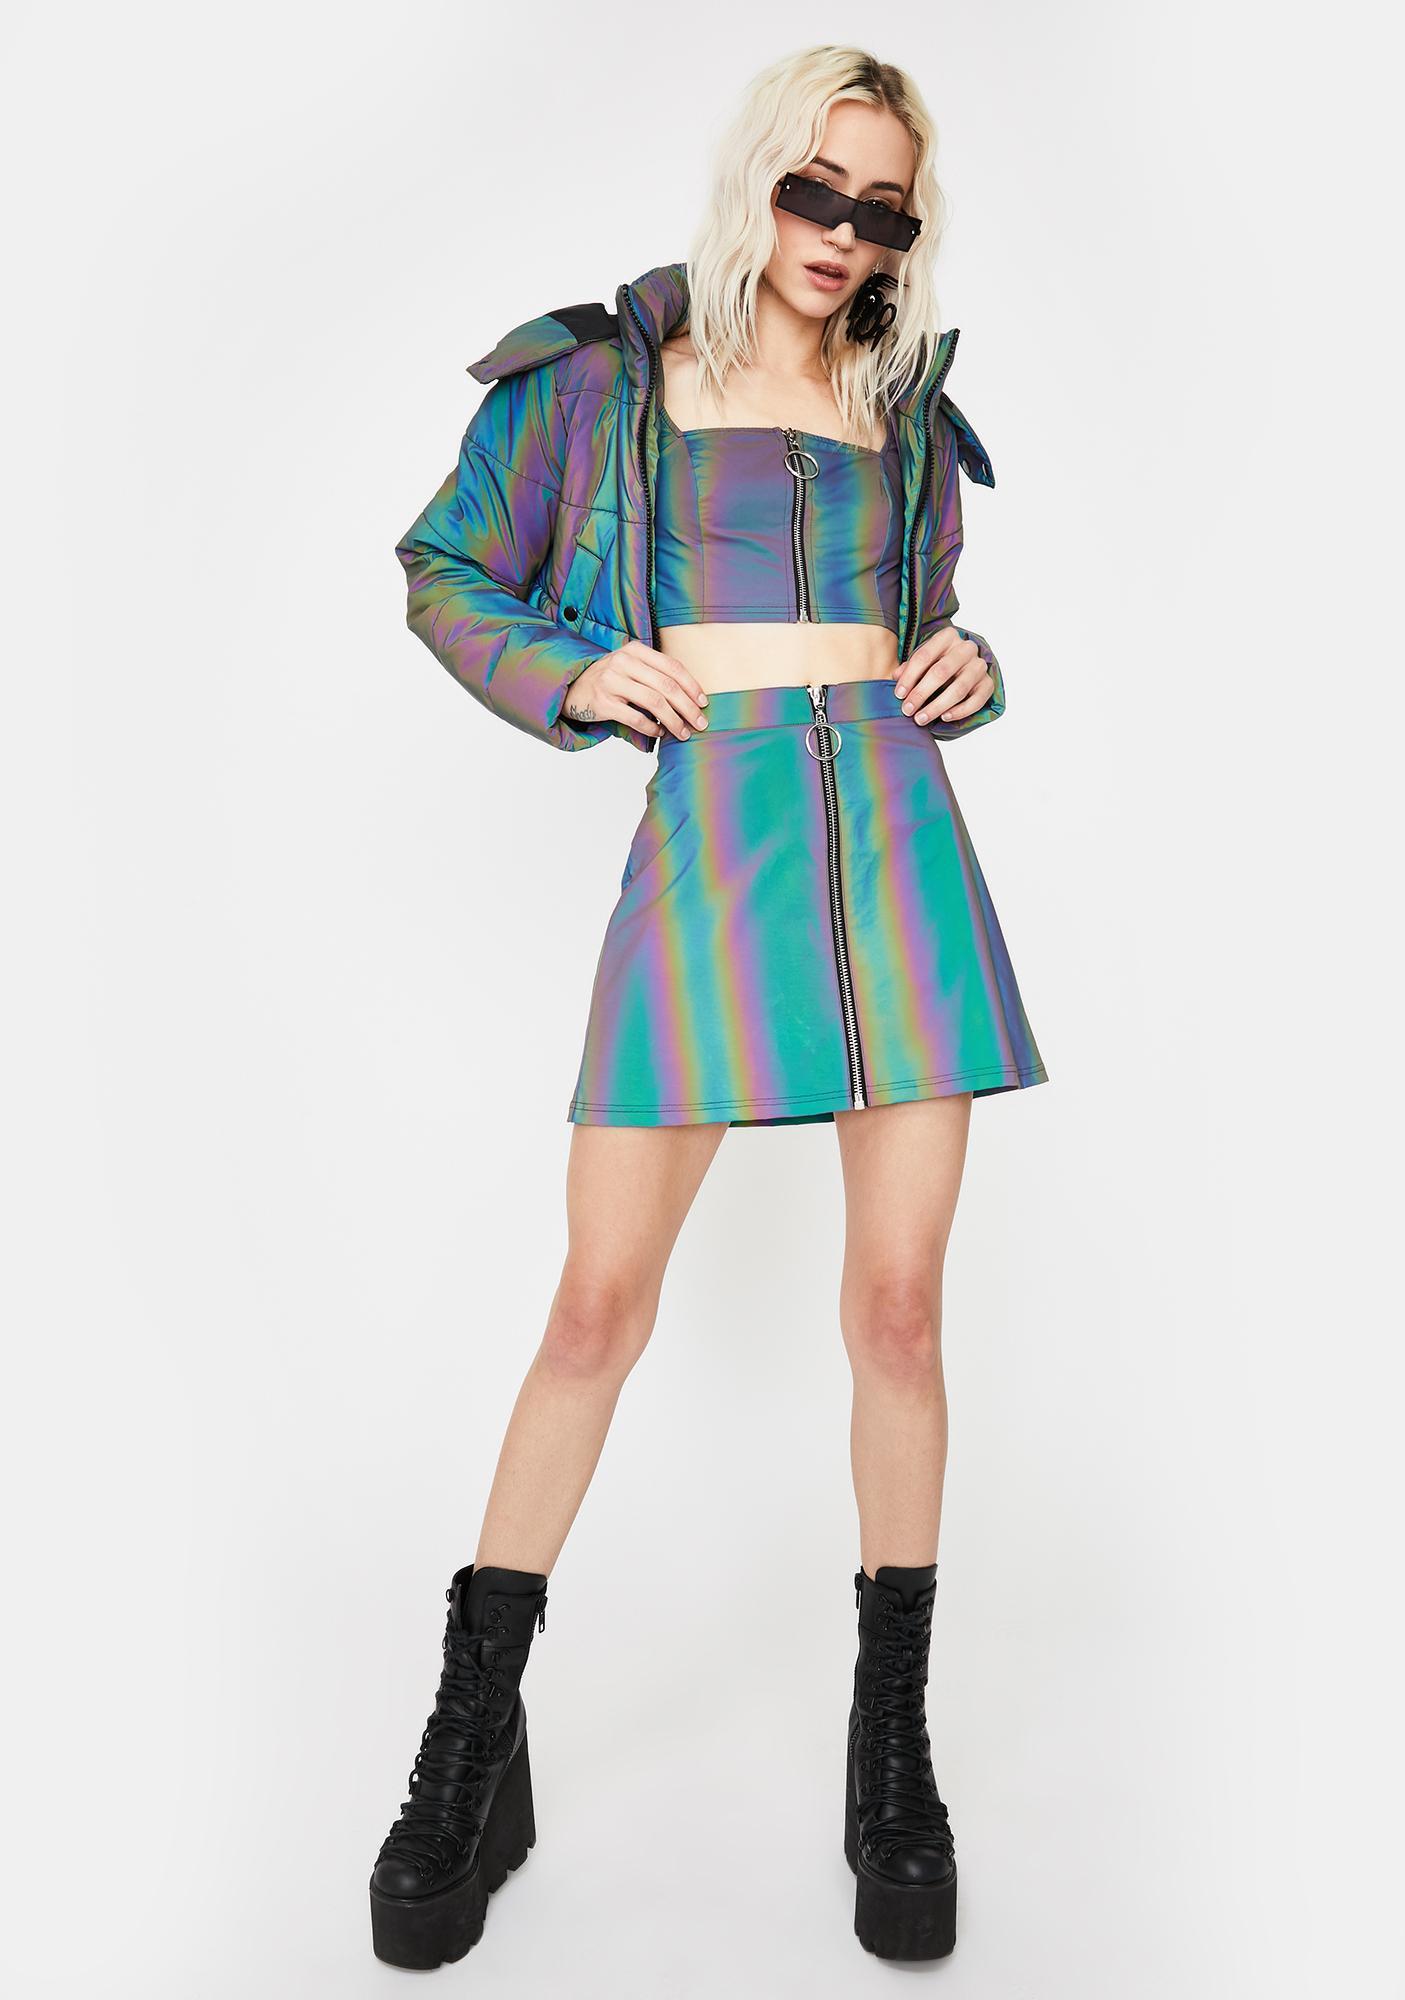 Current Mood Night Savage Signalz Reflective Skirt